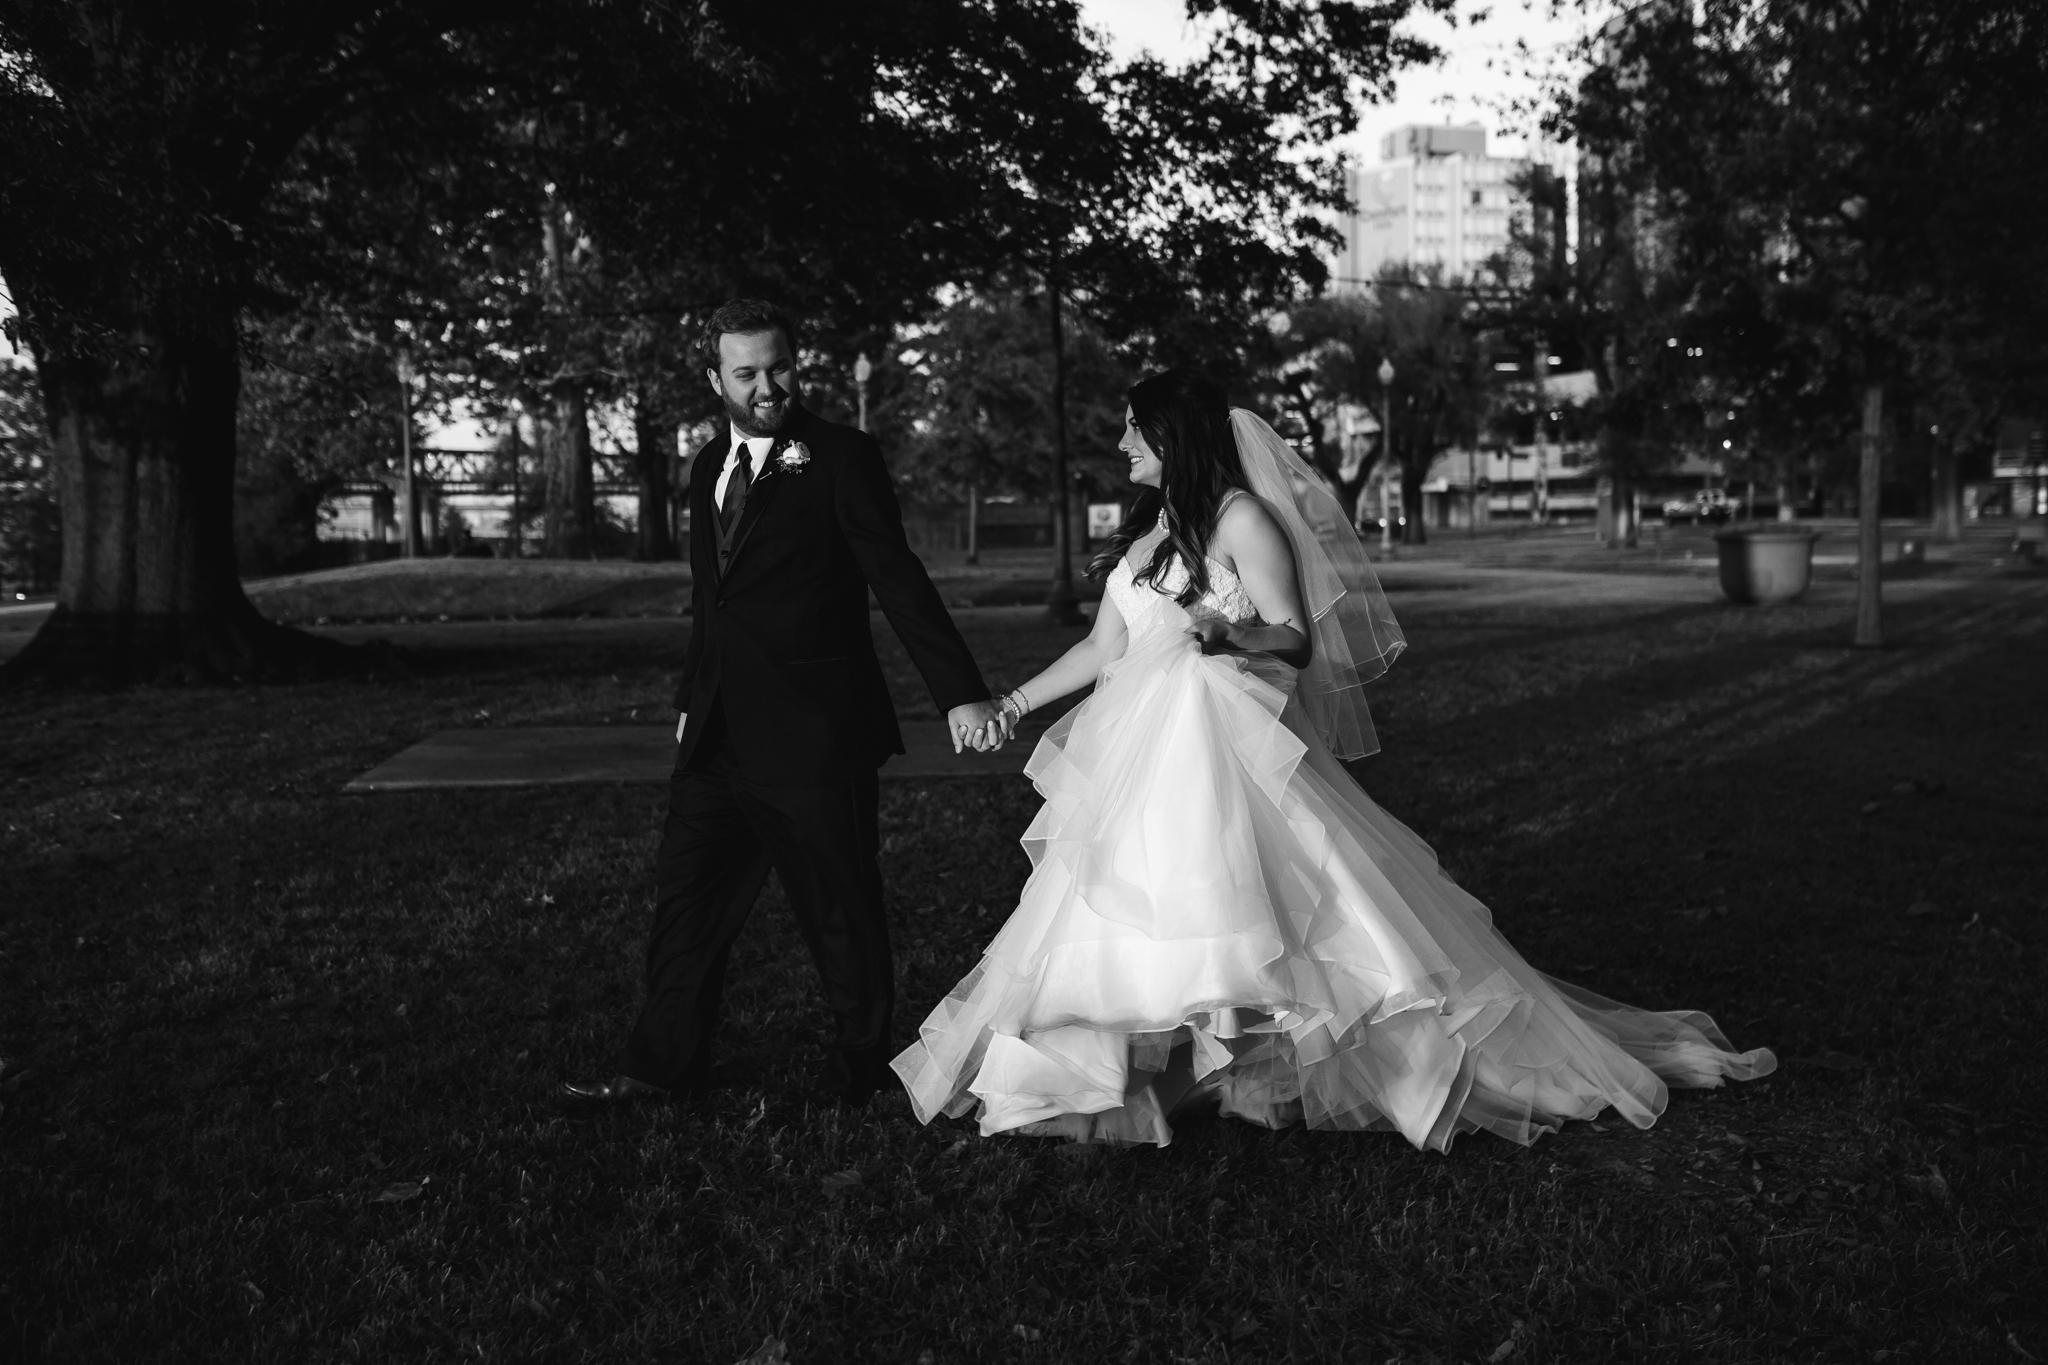 memphis-wedding-photographers-thewarmtharoundyou-ballinese-ballroom (23 of 65).jpg